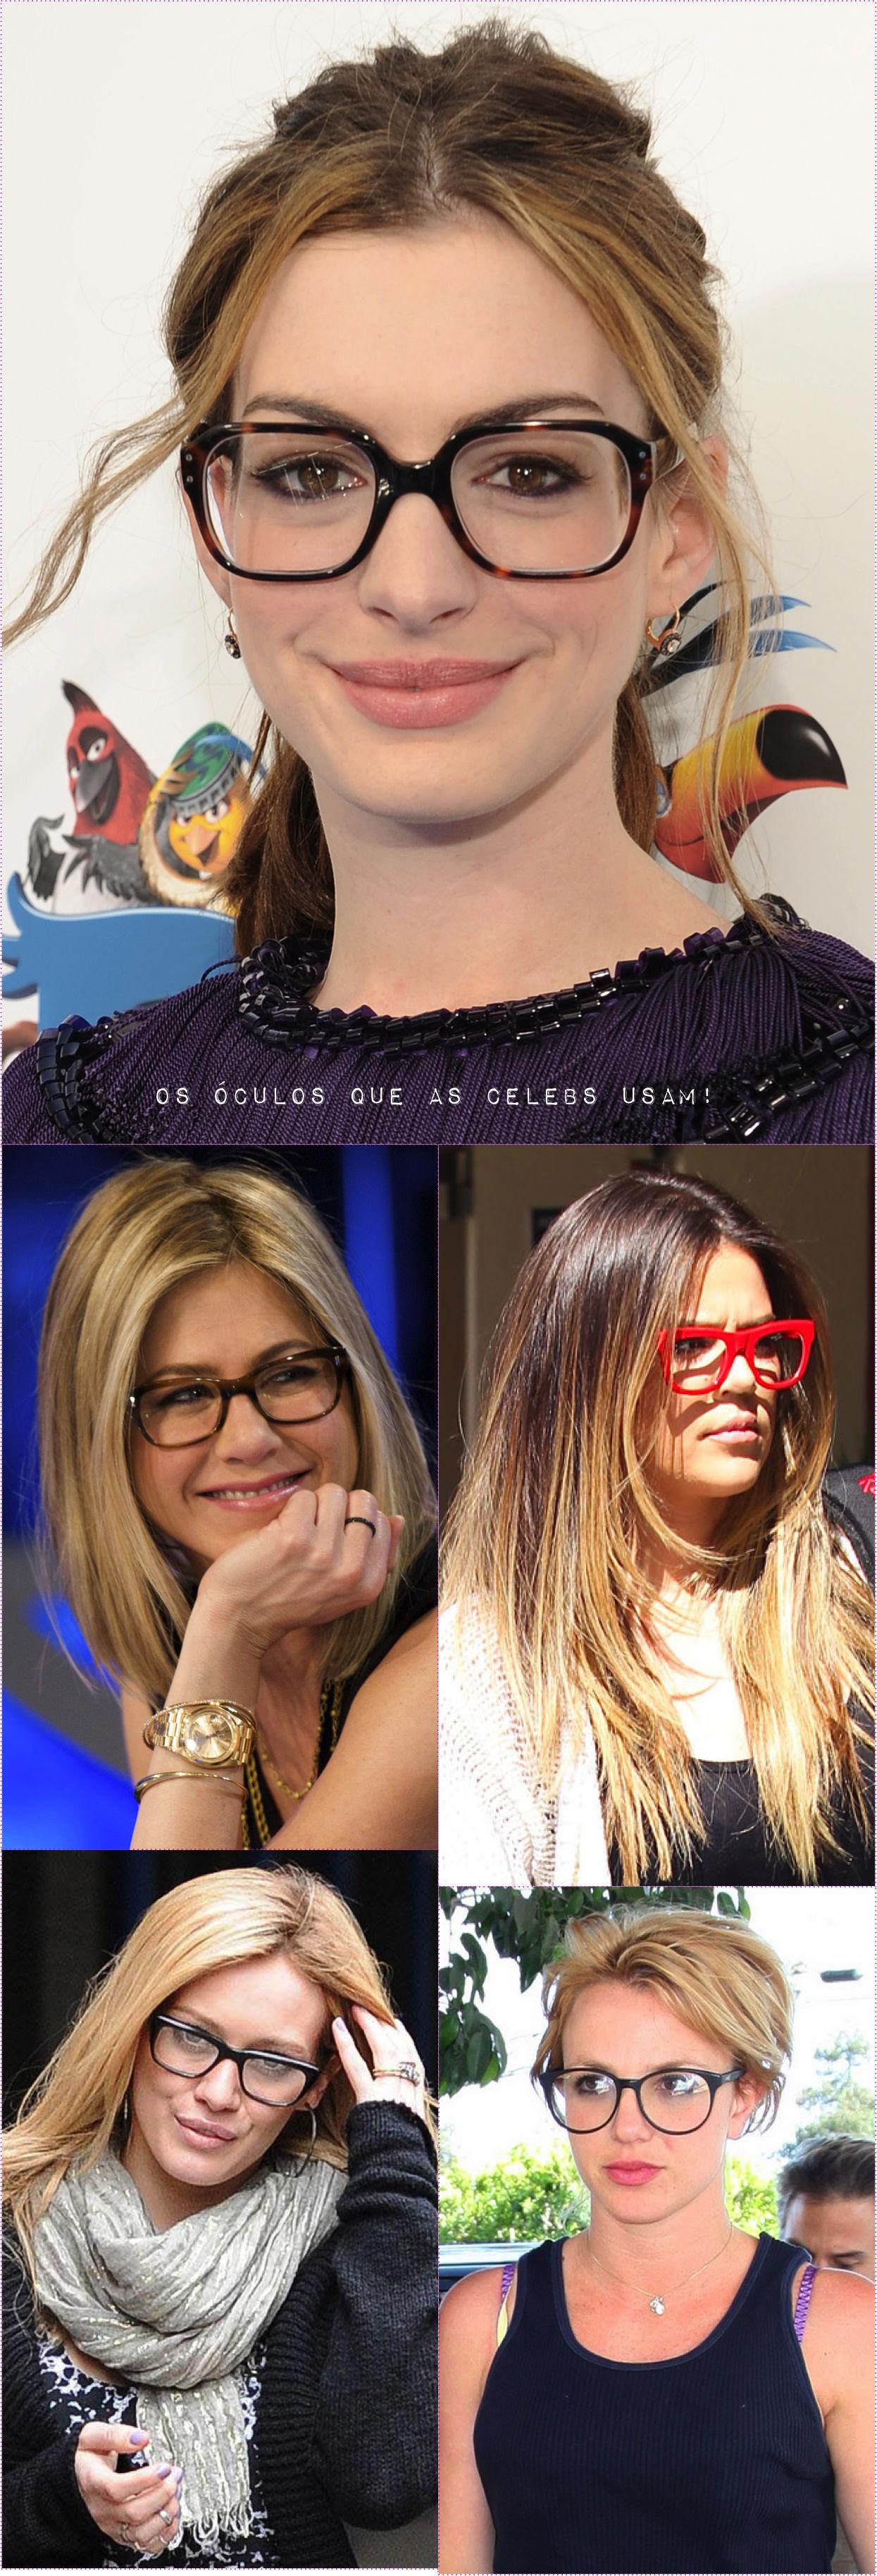 acd4f5fd040f5 AMO esse look da Anne Hathaway com esses óculos grandões